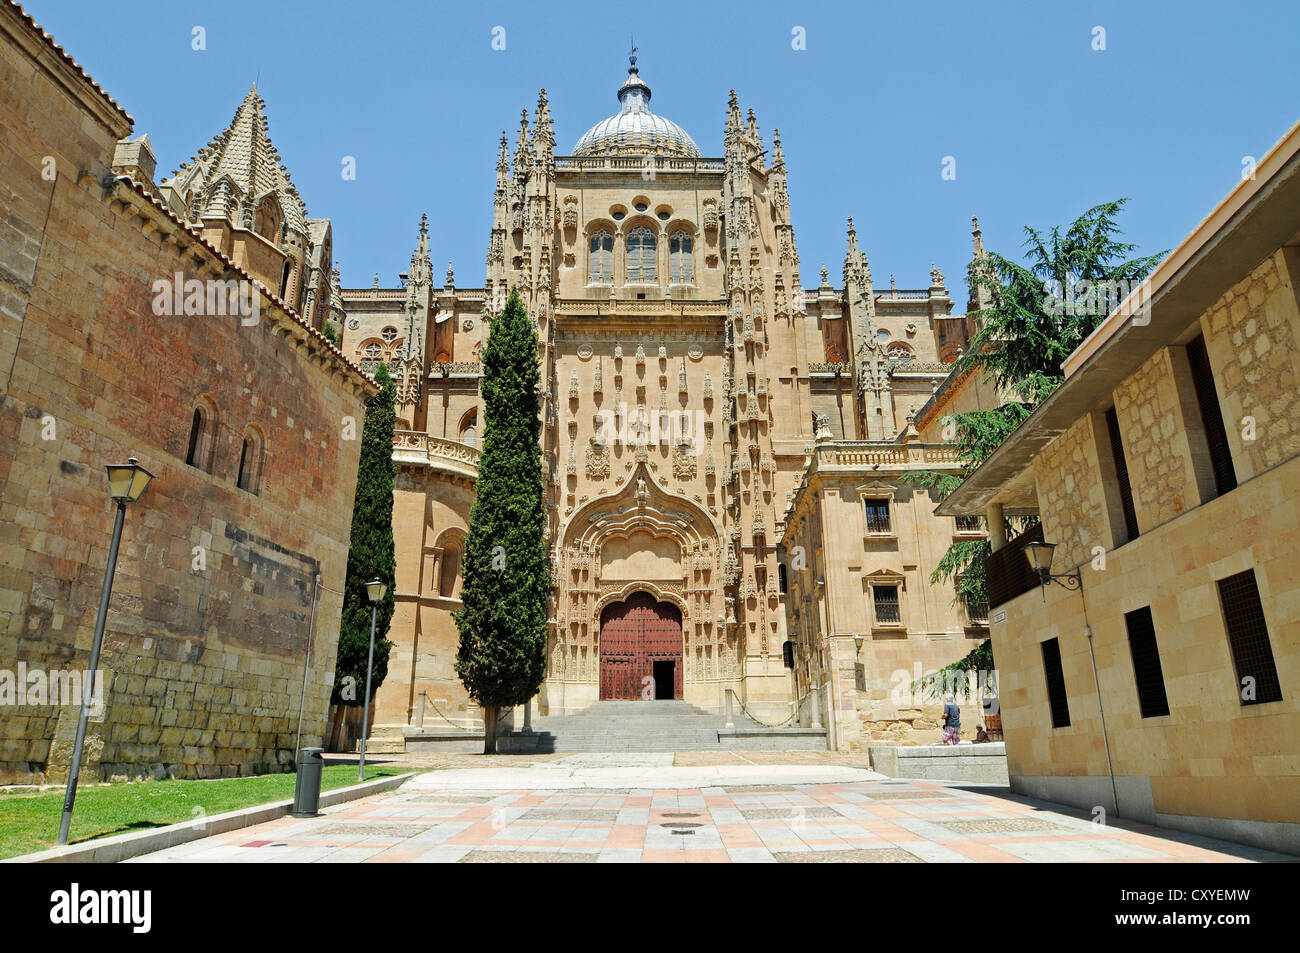 Old Cathedral, Salamanca, Castile-Leon, Spain, Europe, PublicGround - Stock Image